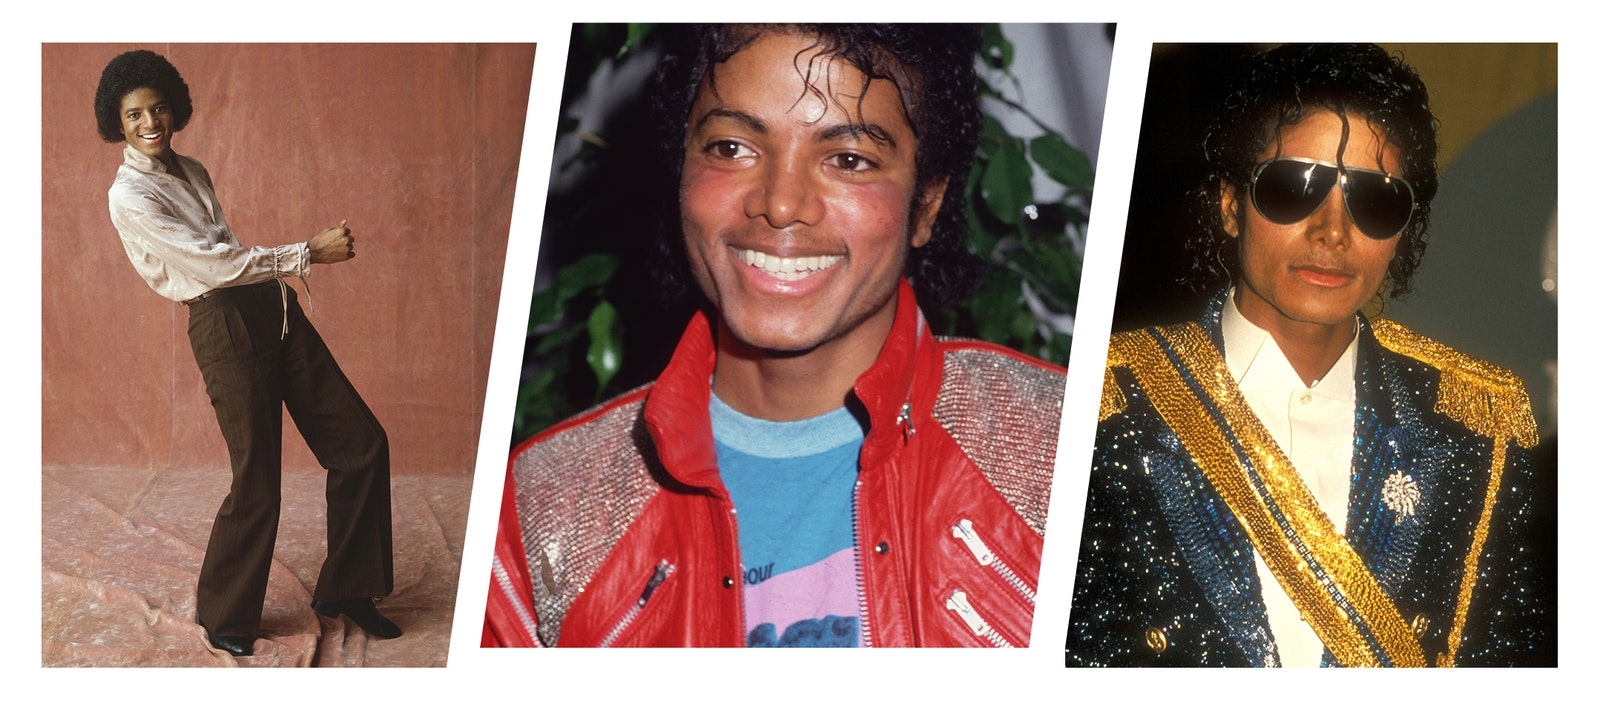 The Best MJ Looks Louis Vuitton Should Bring Back    ONE37pm e729ca5b5fd